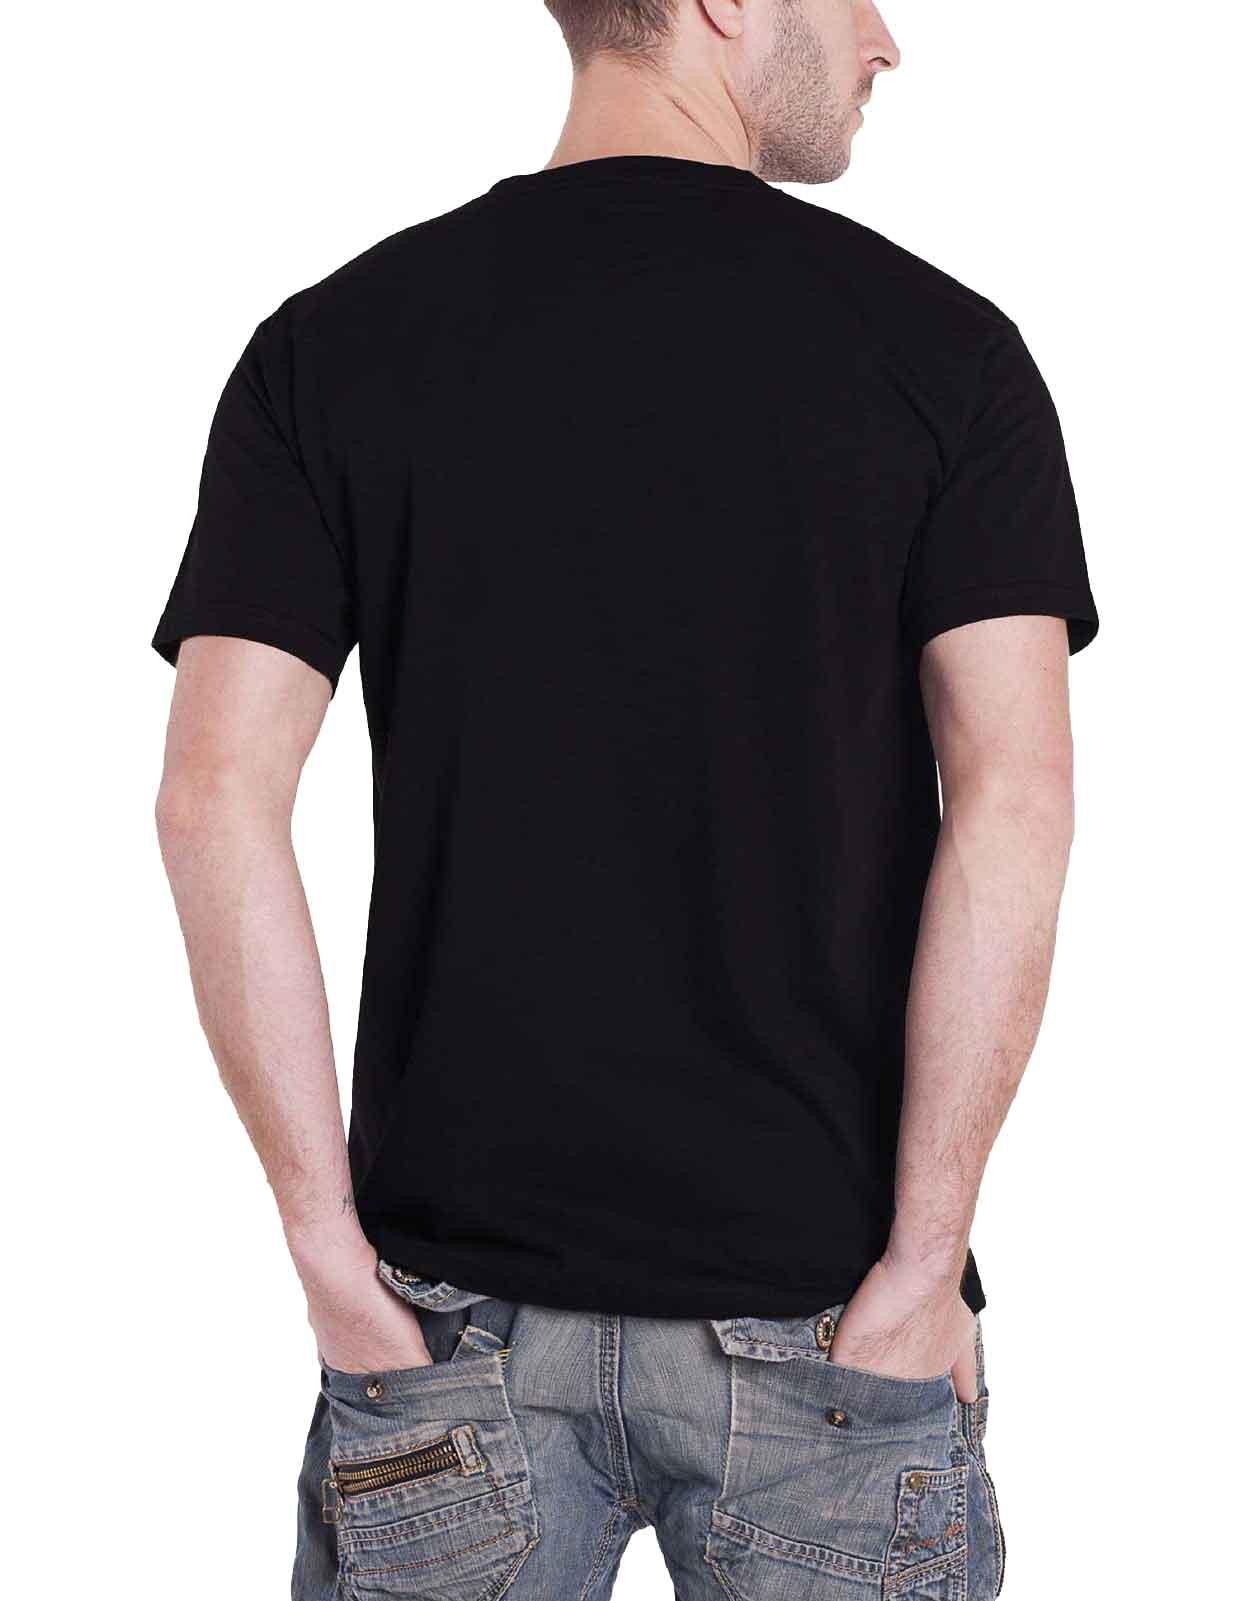 Officiel-Jimi-Hendrix-T-Shirt-Purple-Haze-Are-you-experienced-Logo-Homme-NEUF miniature 5